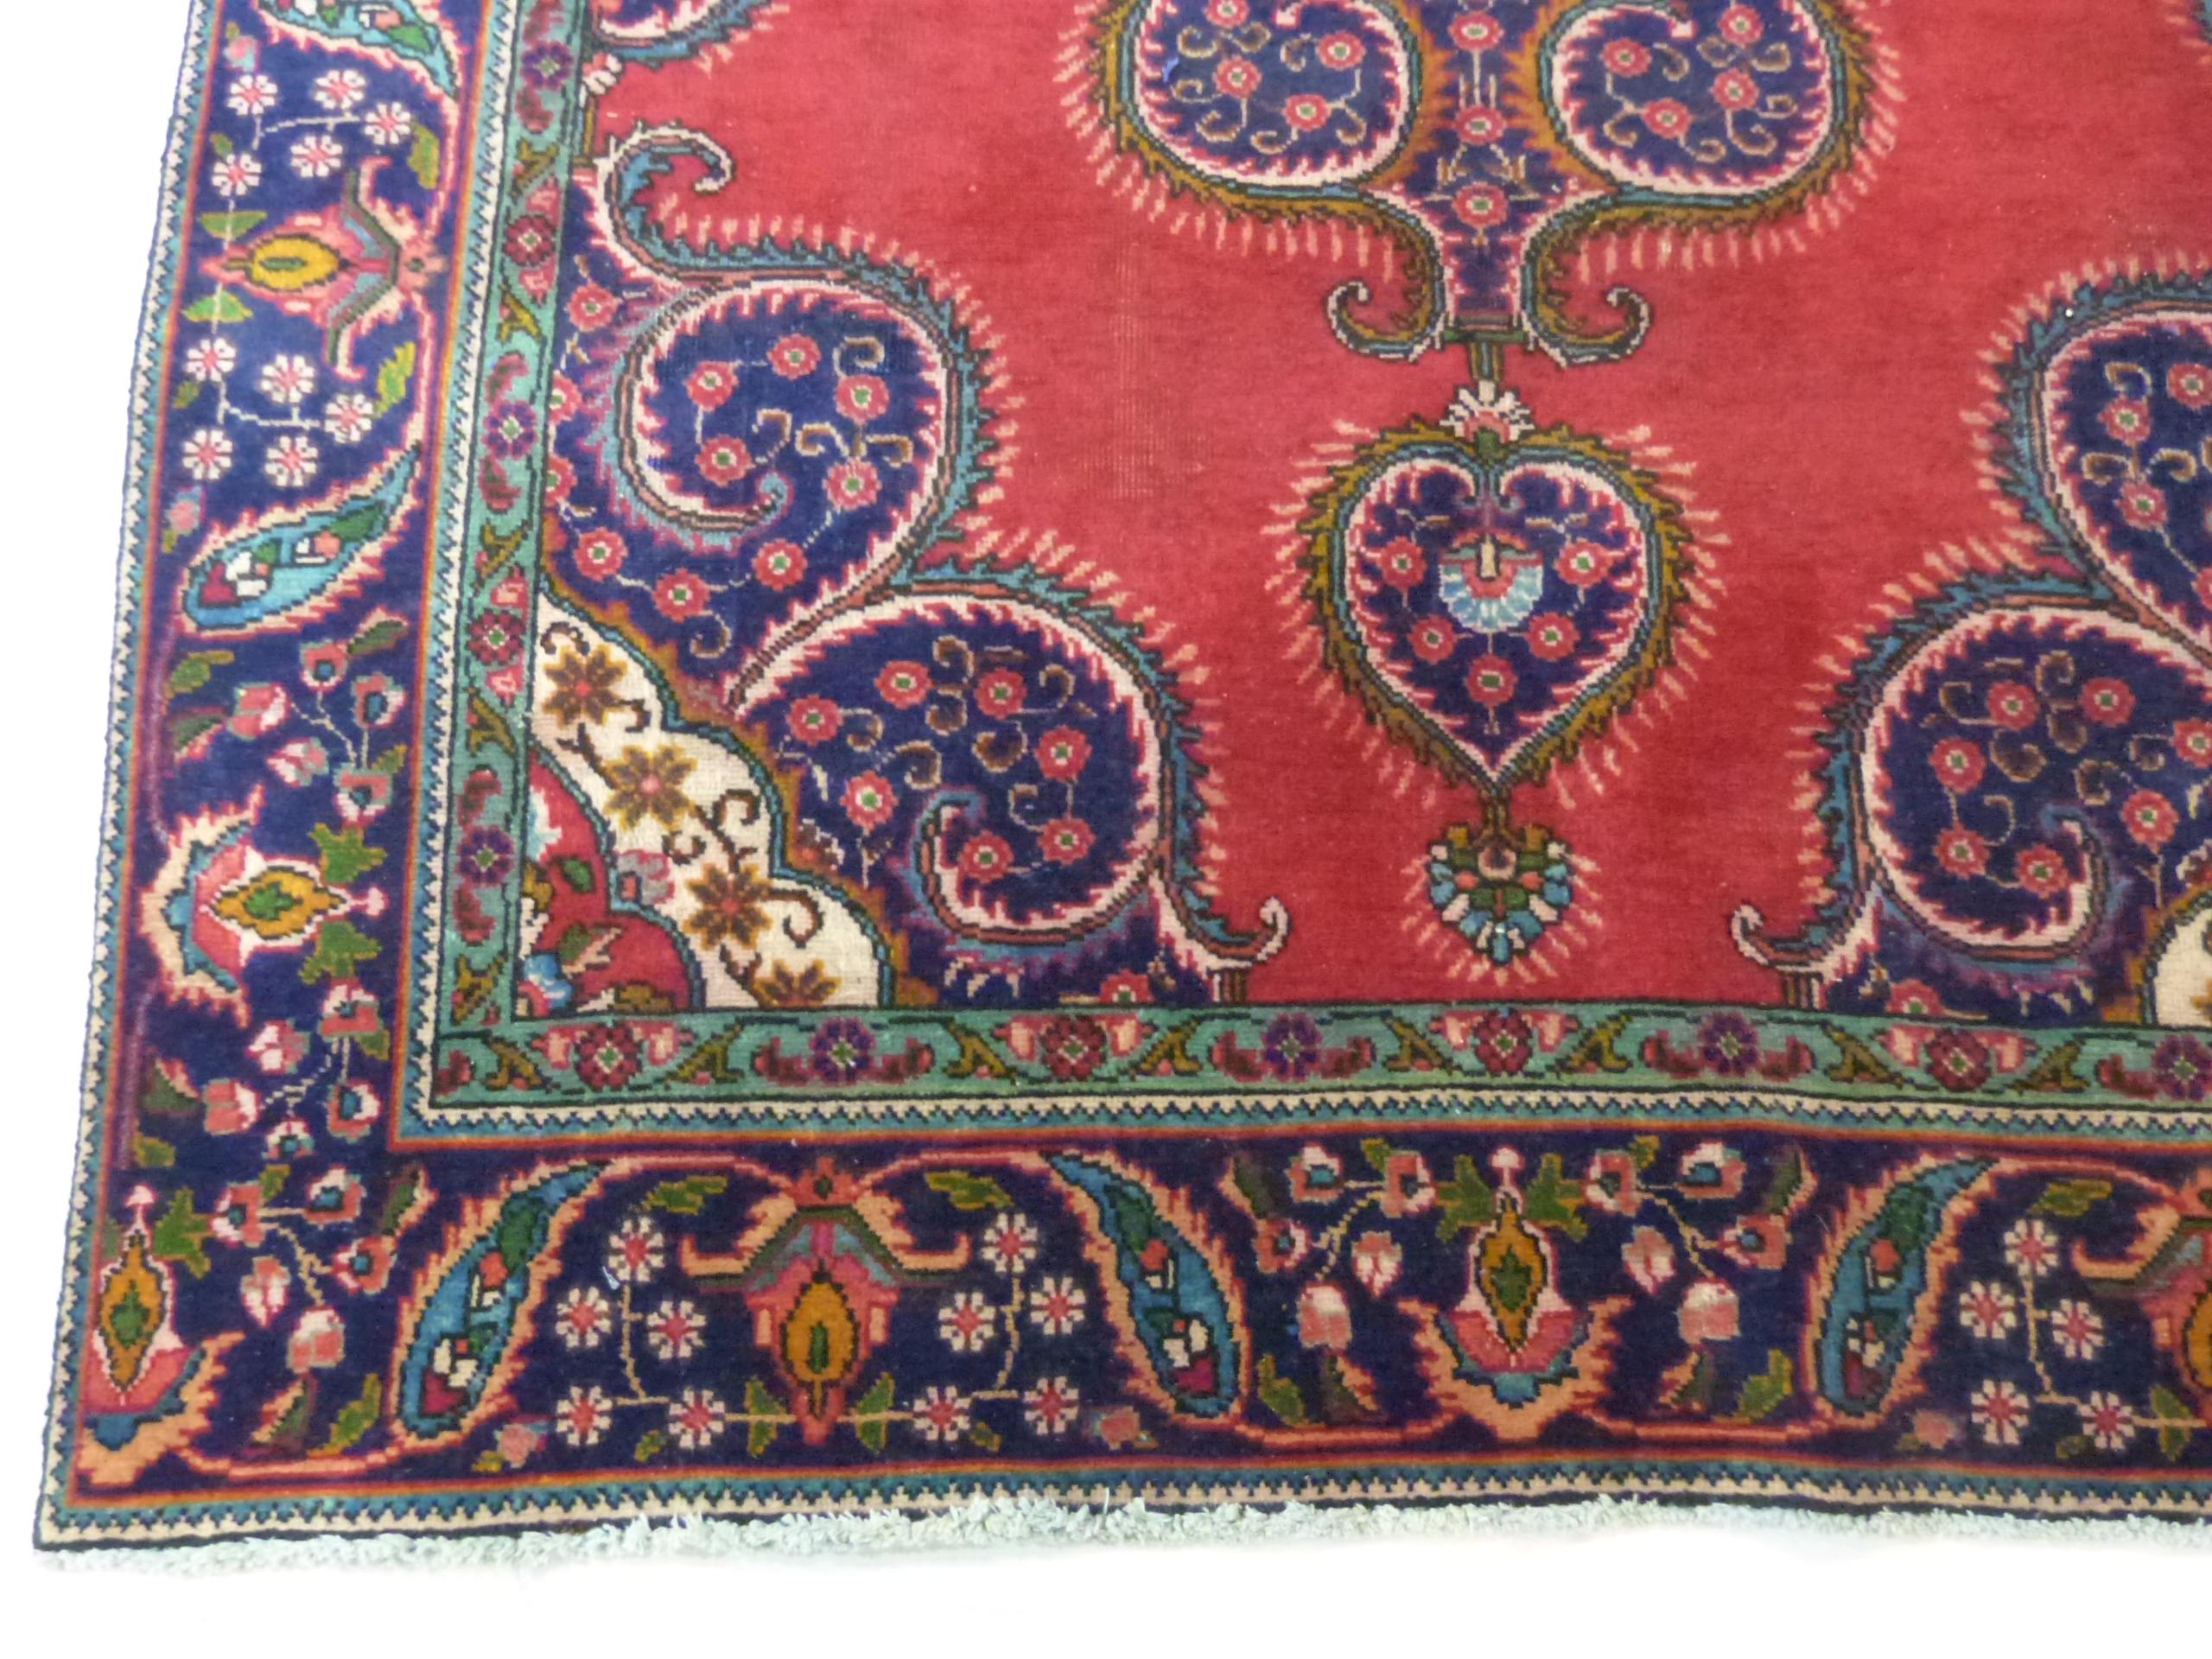 Deep ground thick pile Persian Narouan Carpet,decorated with various motifs & symbols 276cm x - Image 3 of 9